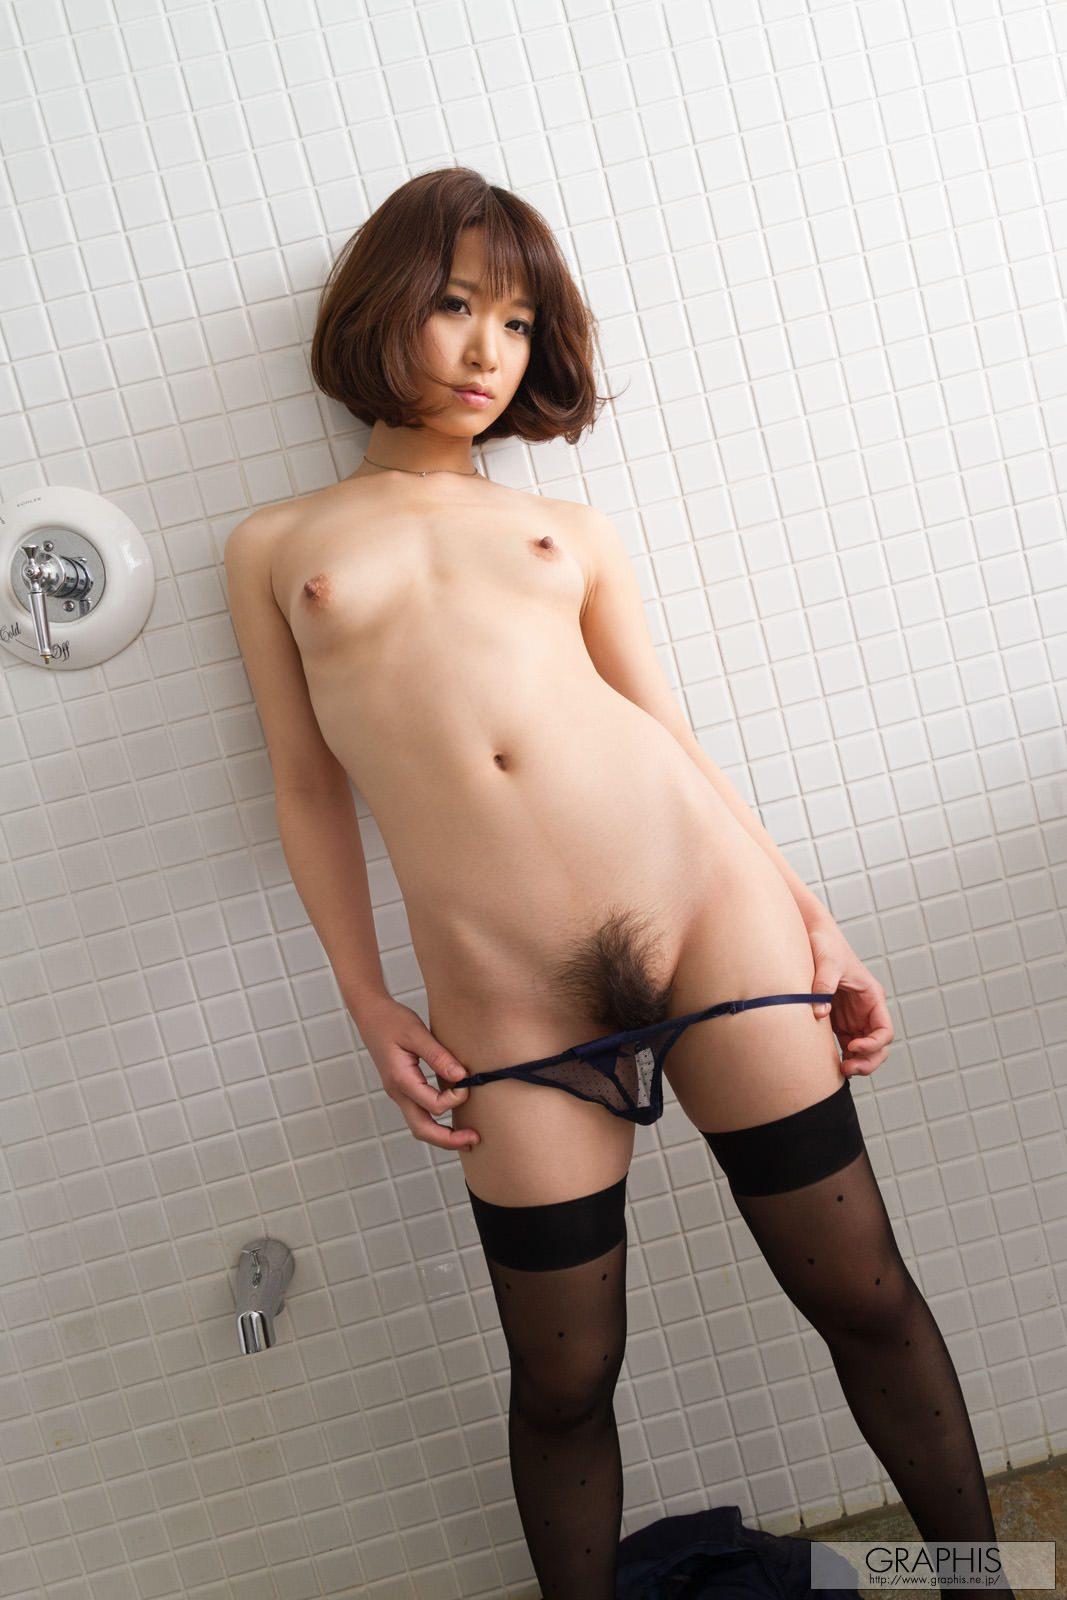 mayu-kamiya-bathroom-black-stockings-asian-naked-graphis-15